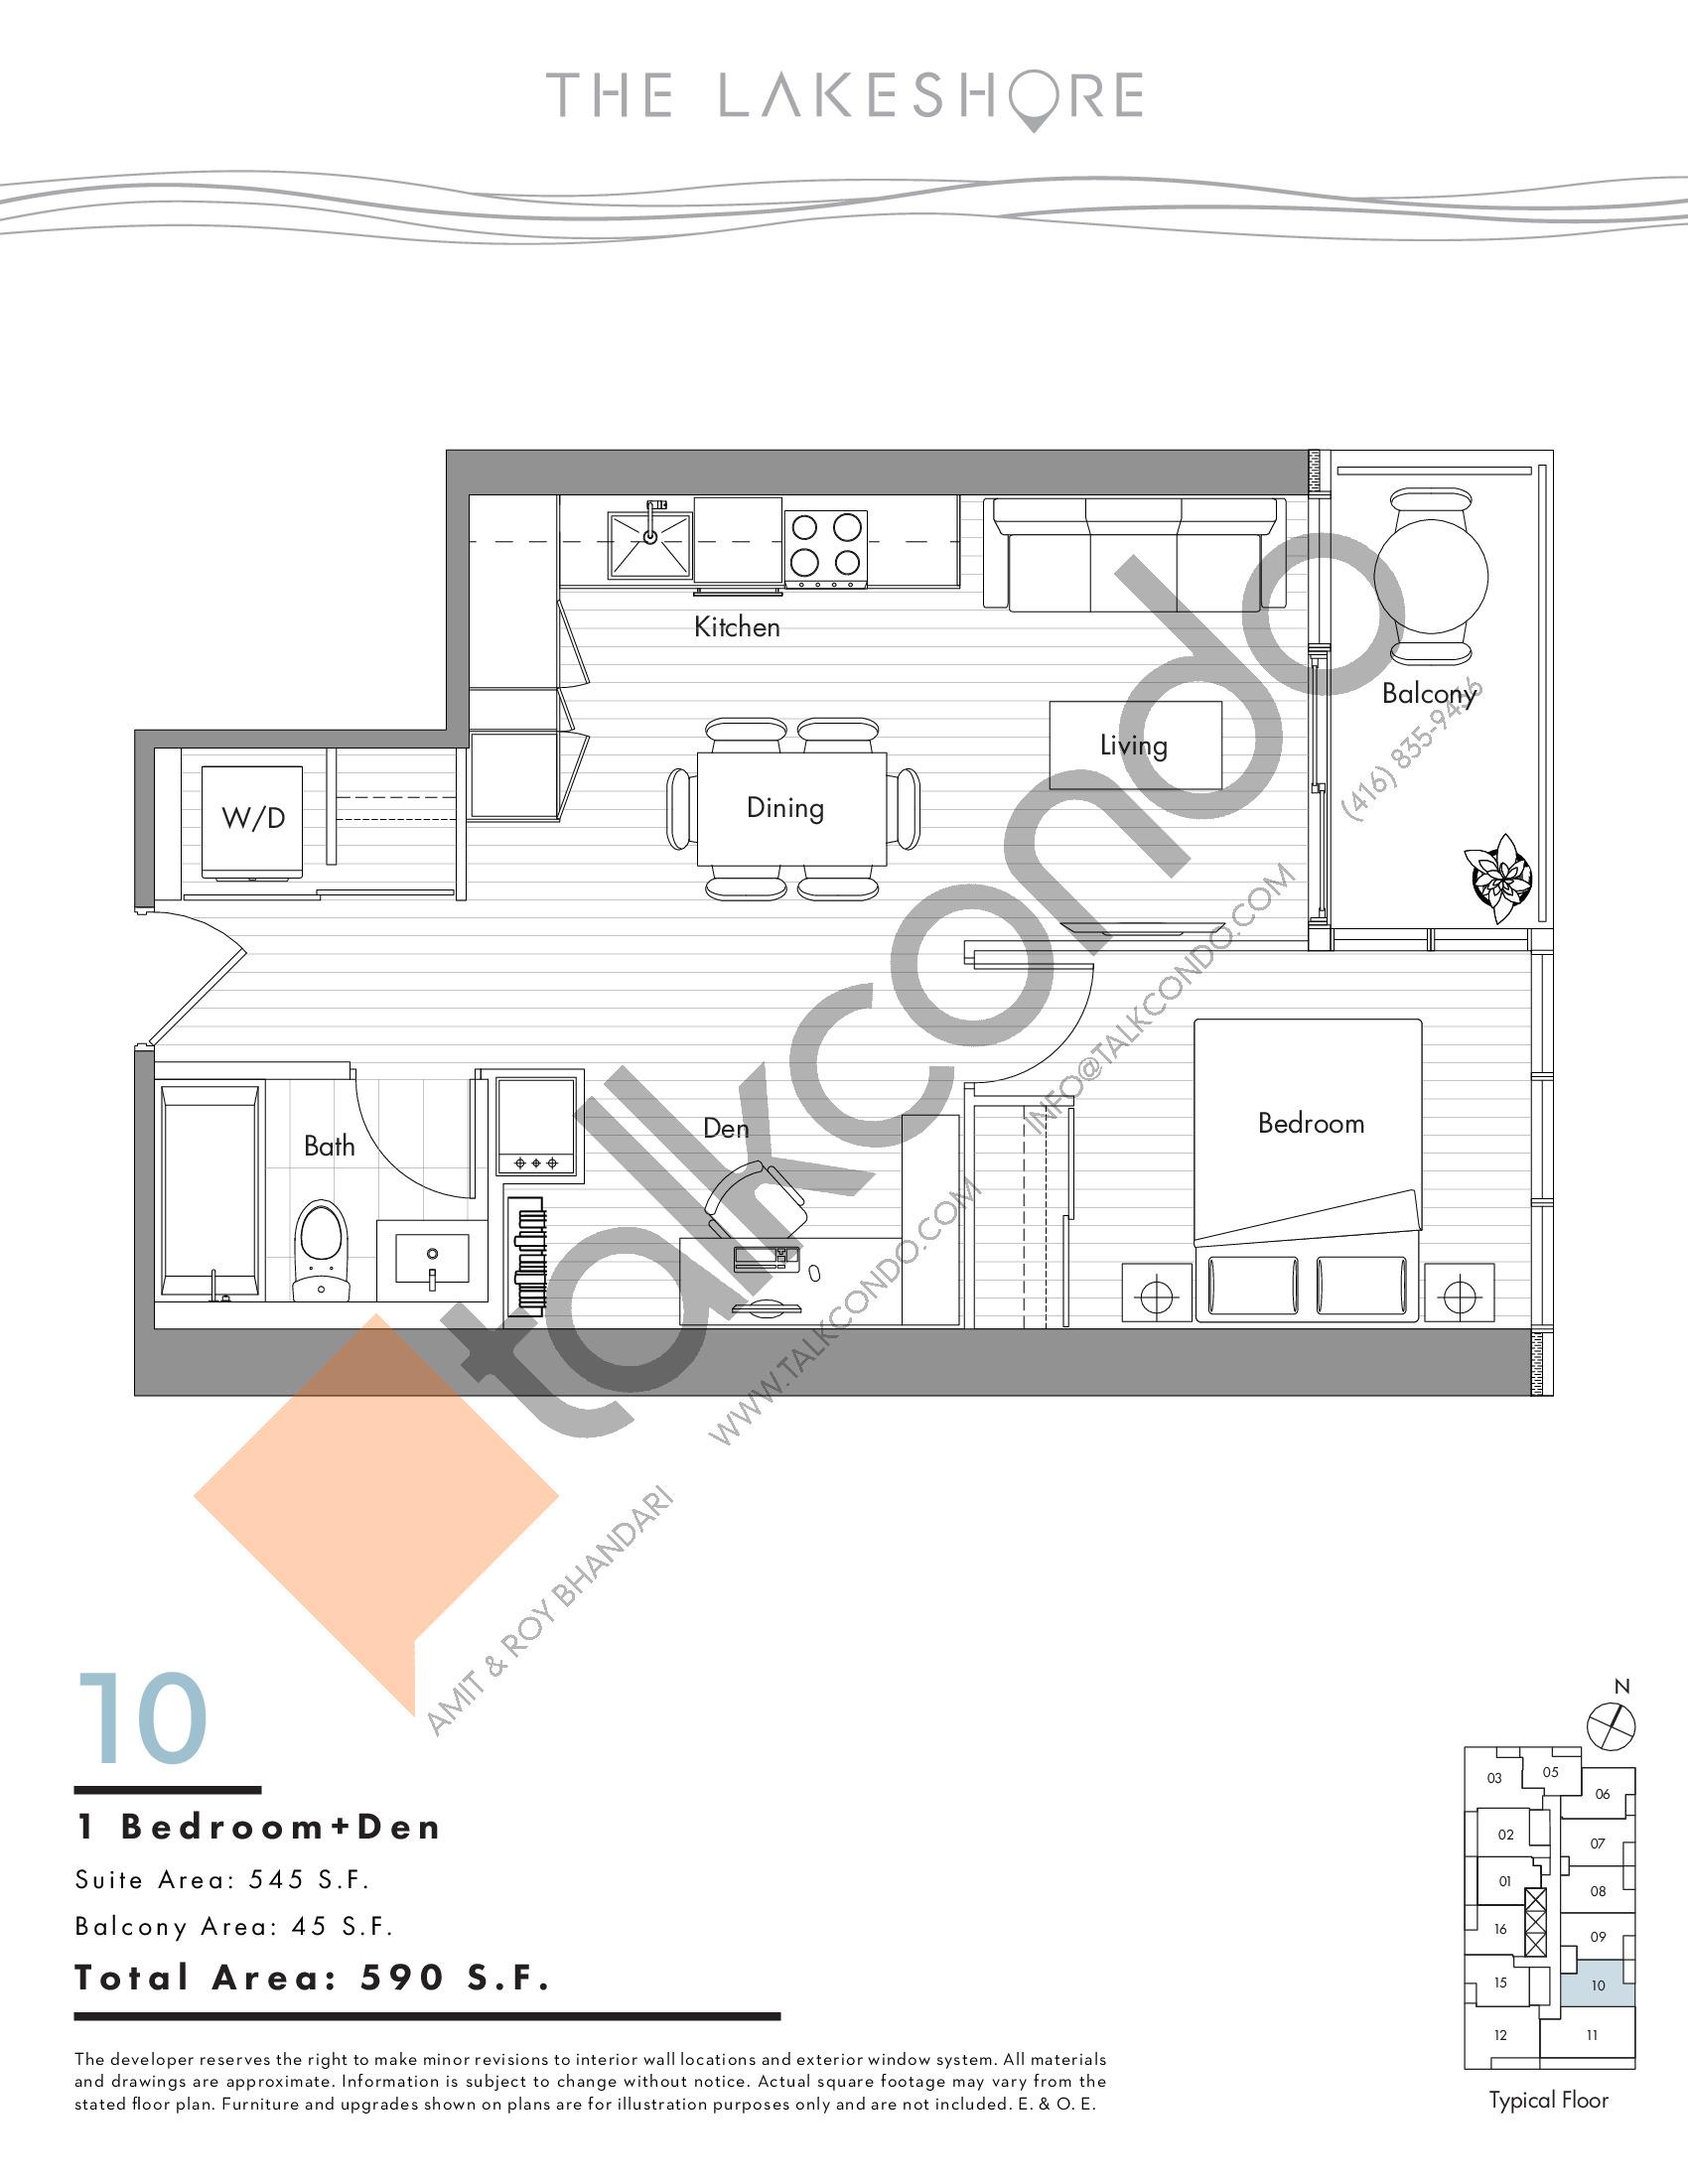 10 Floor Plan at The LakeShore Condos - 545 sq.ft